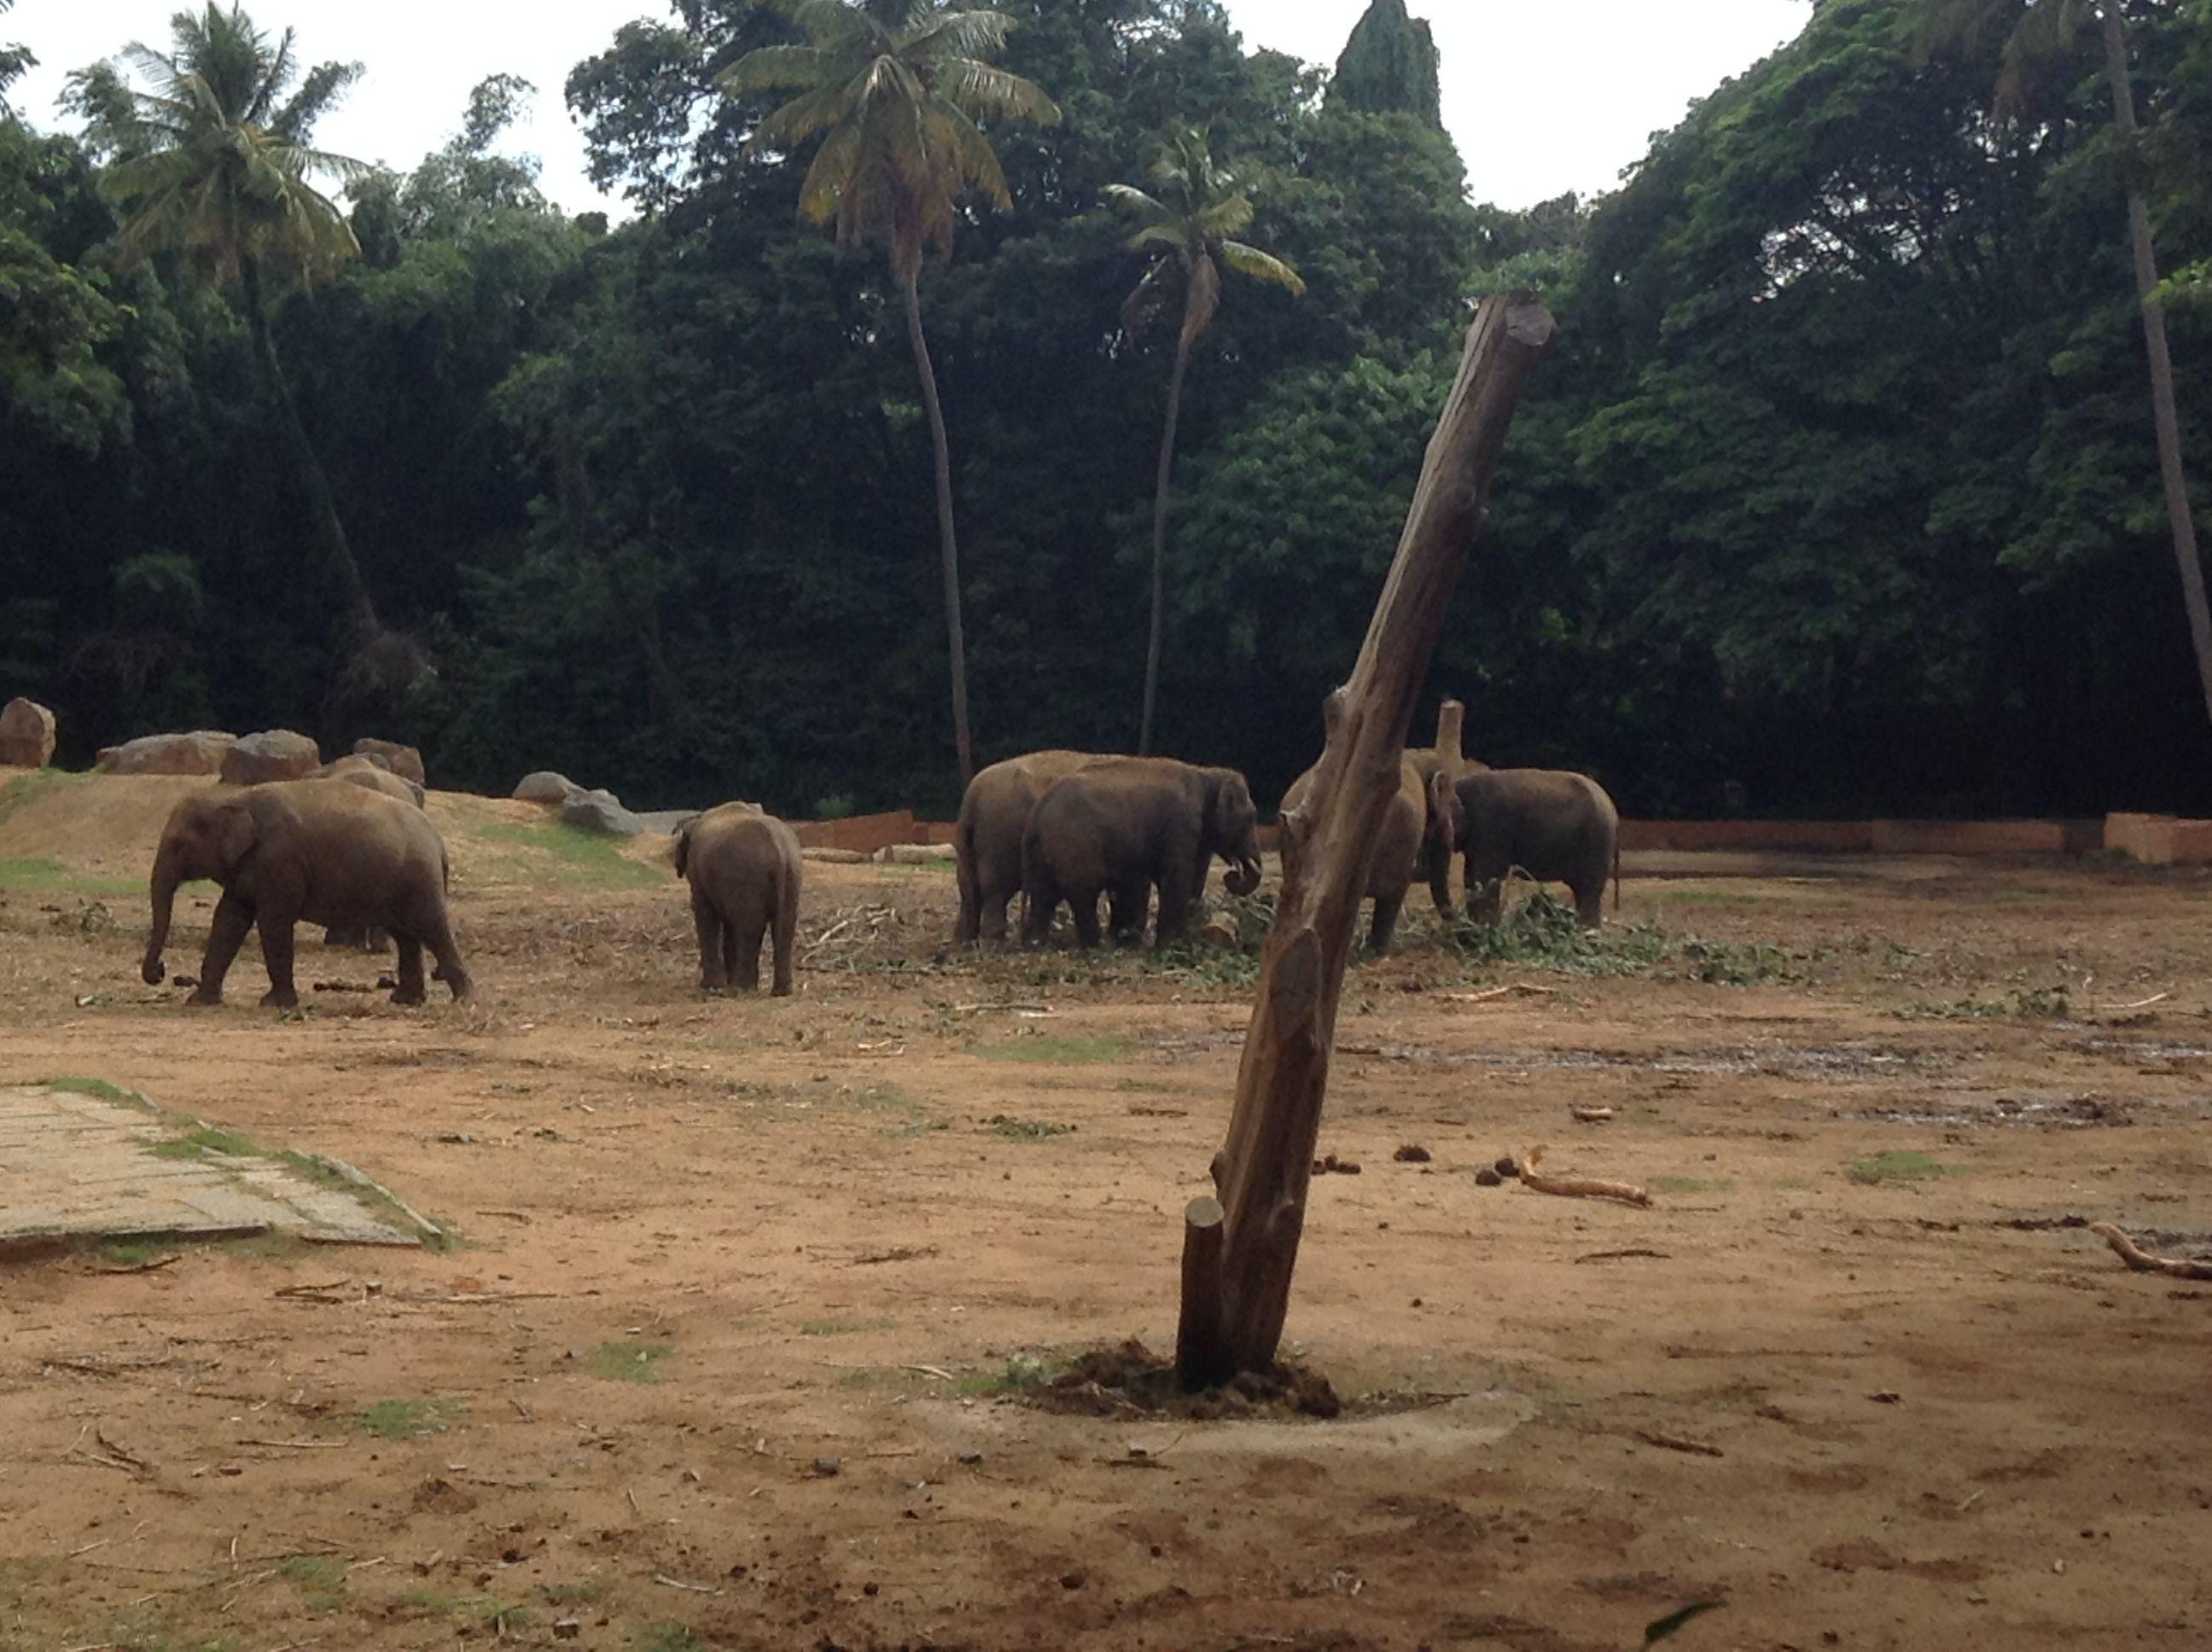 2d6795a75c2bbd52524a2c46421dcf1b - Mysore Zoo Sri Chamarajendra Zoological Gardens